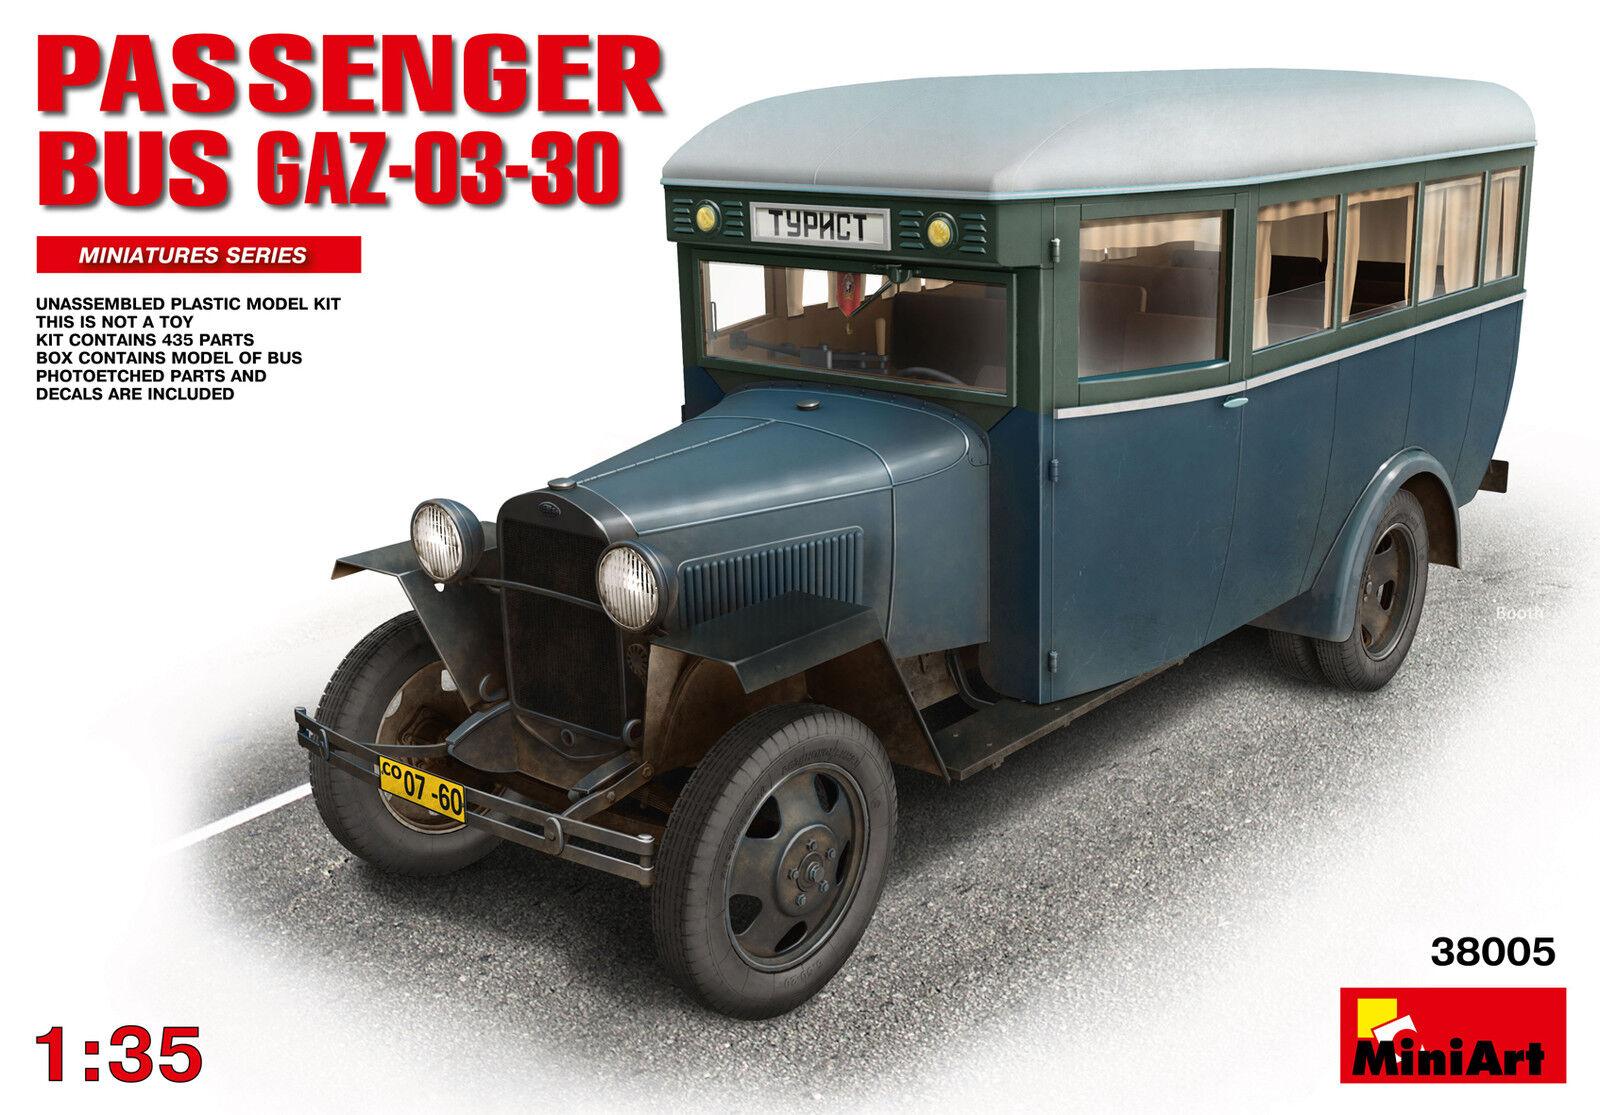 Miniart 1 35 Passenger Bus GAZ-03-30 Plastic Model Kit